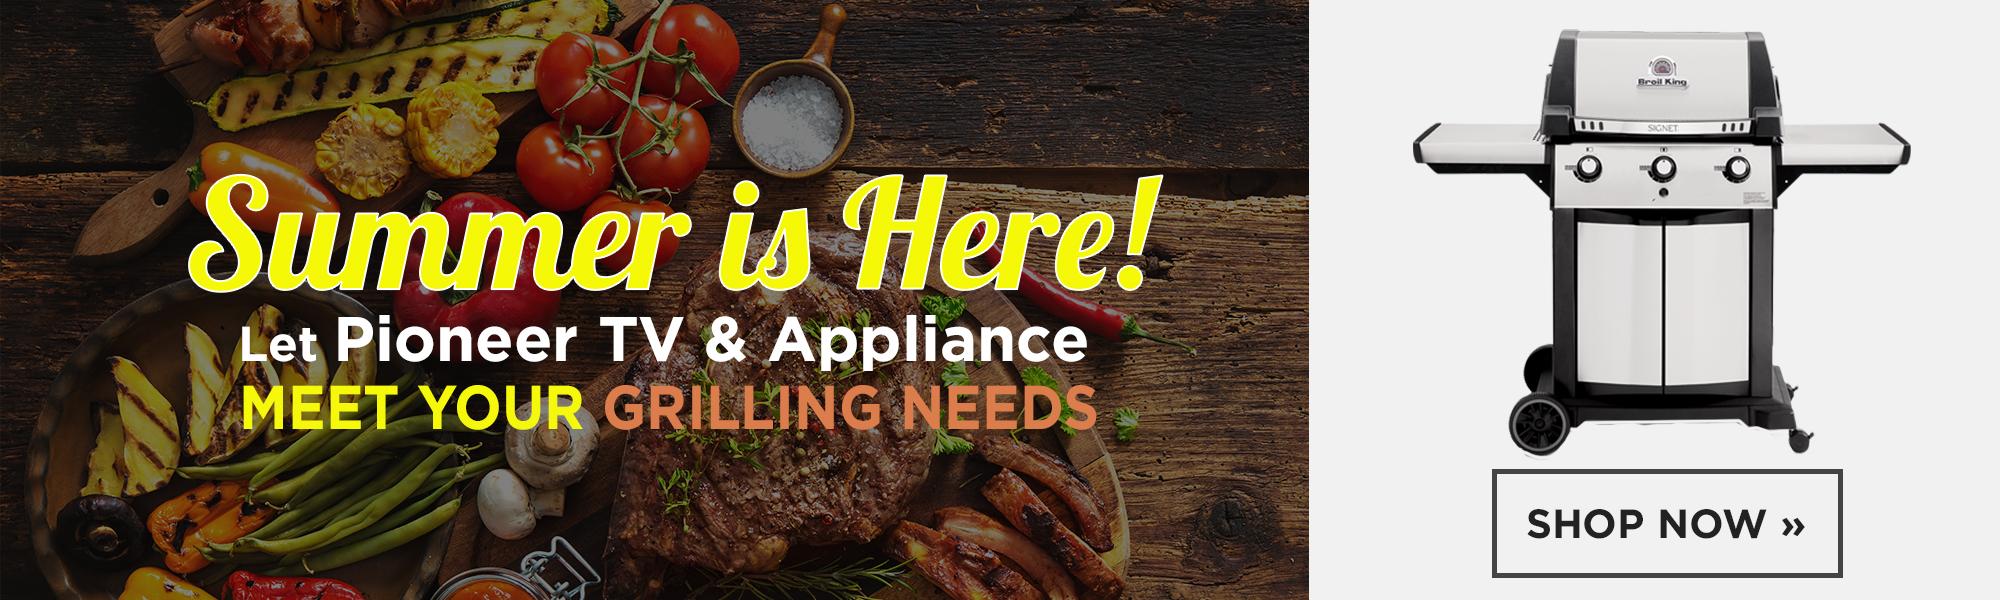 Pioneer TV & Appliance -